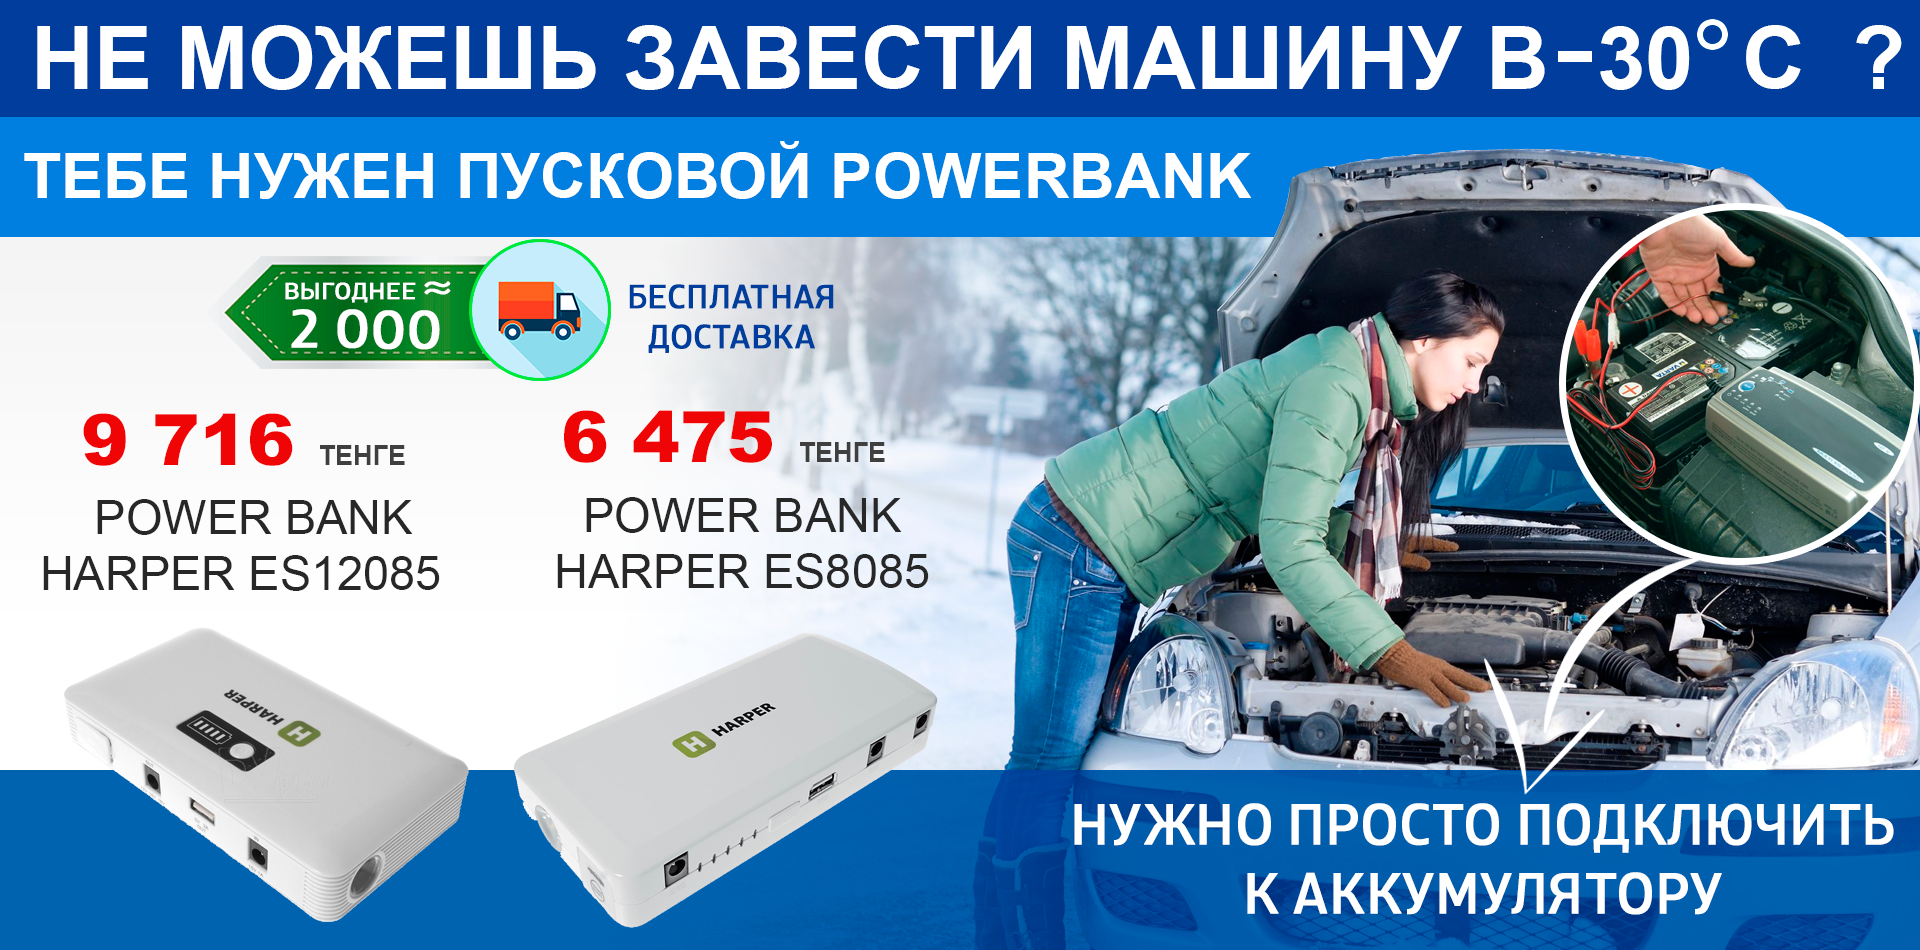 ПУСКОВОЙ АВТО-АККУМУЛЯТОР HARPER ES8085